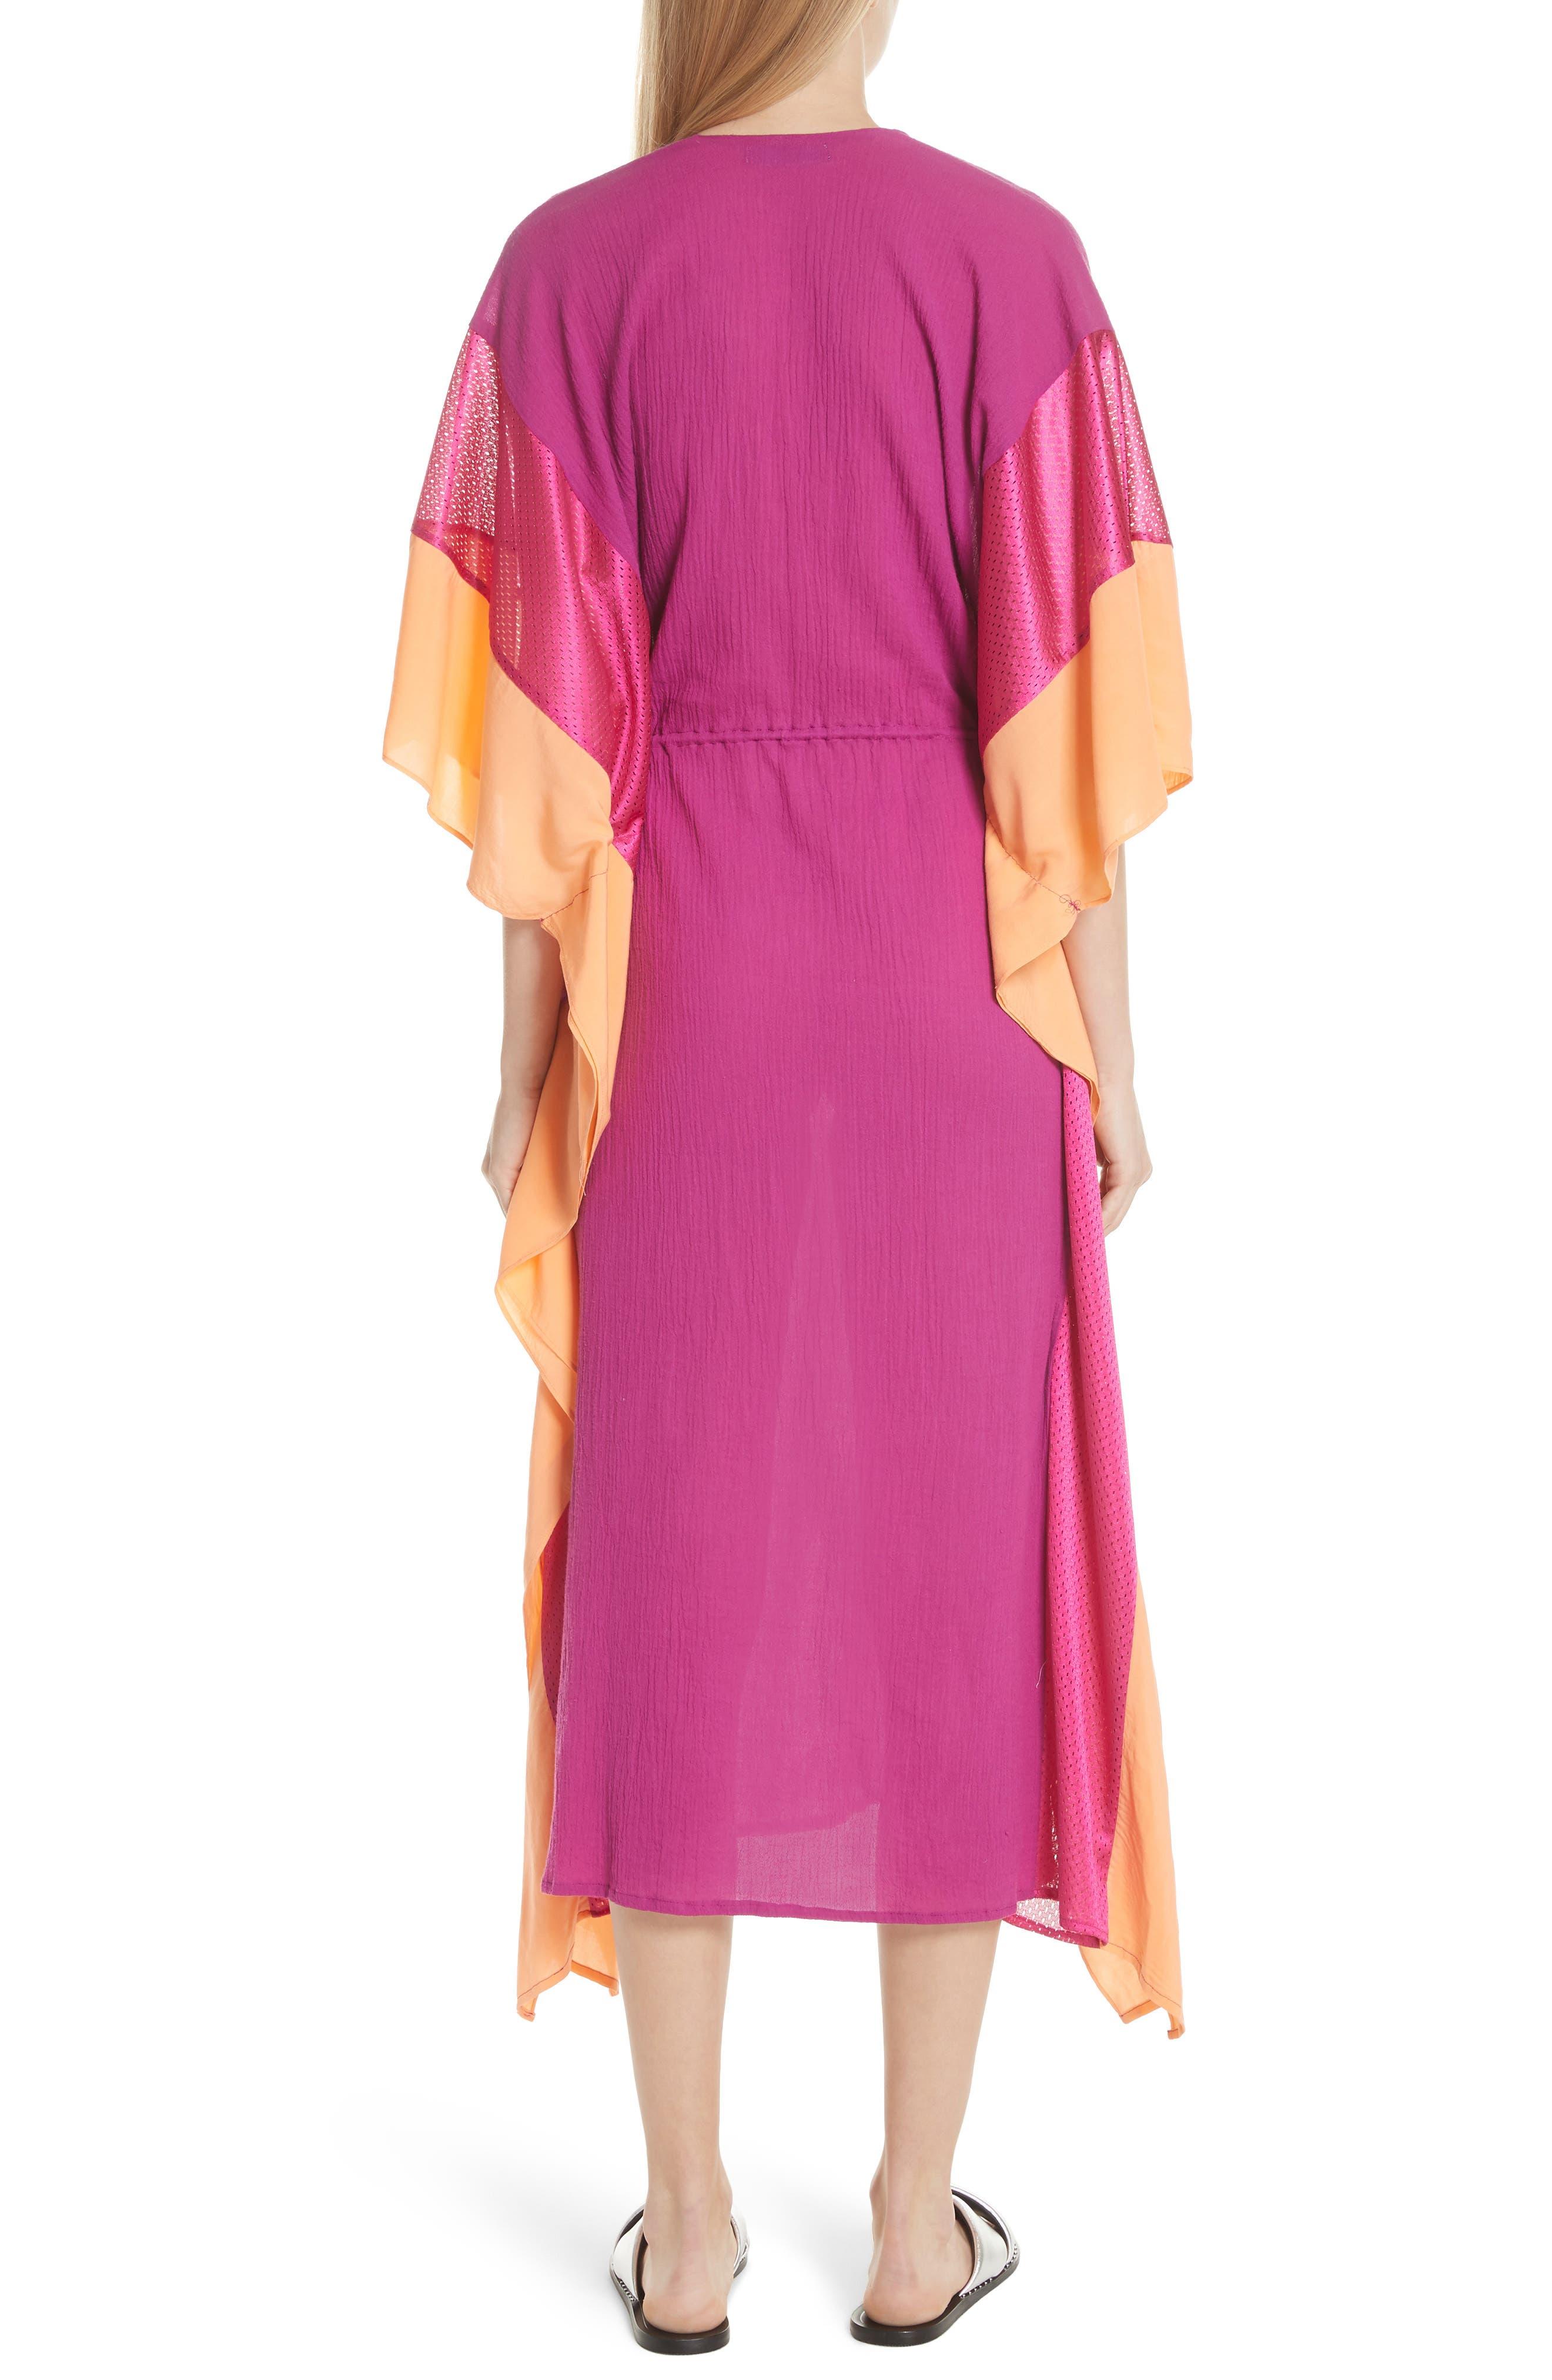 Sun Dance Caftan Dress,                             Alternate thumbnail 2, color,                             Magenta/ Orange